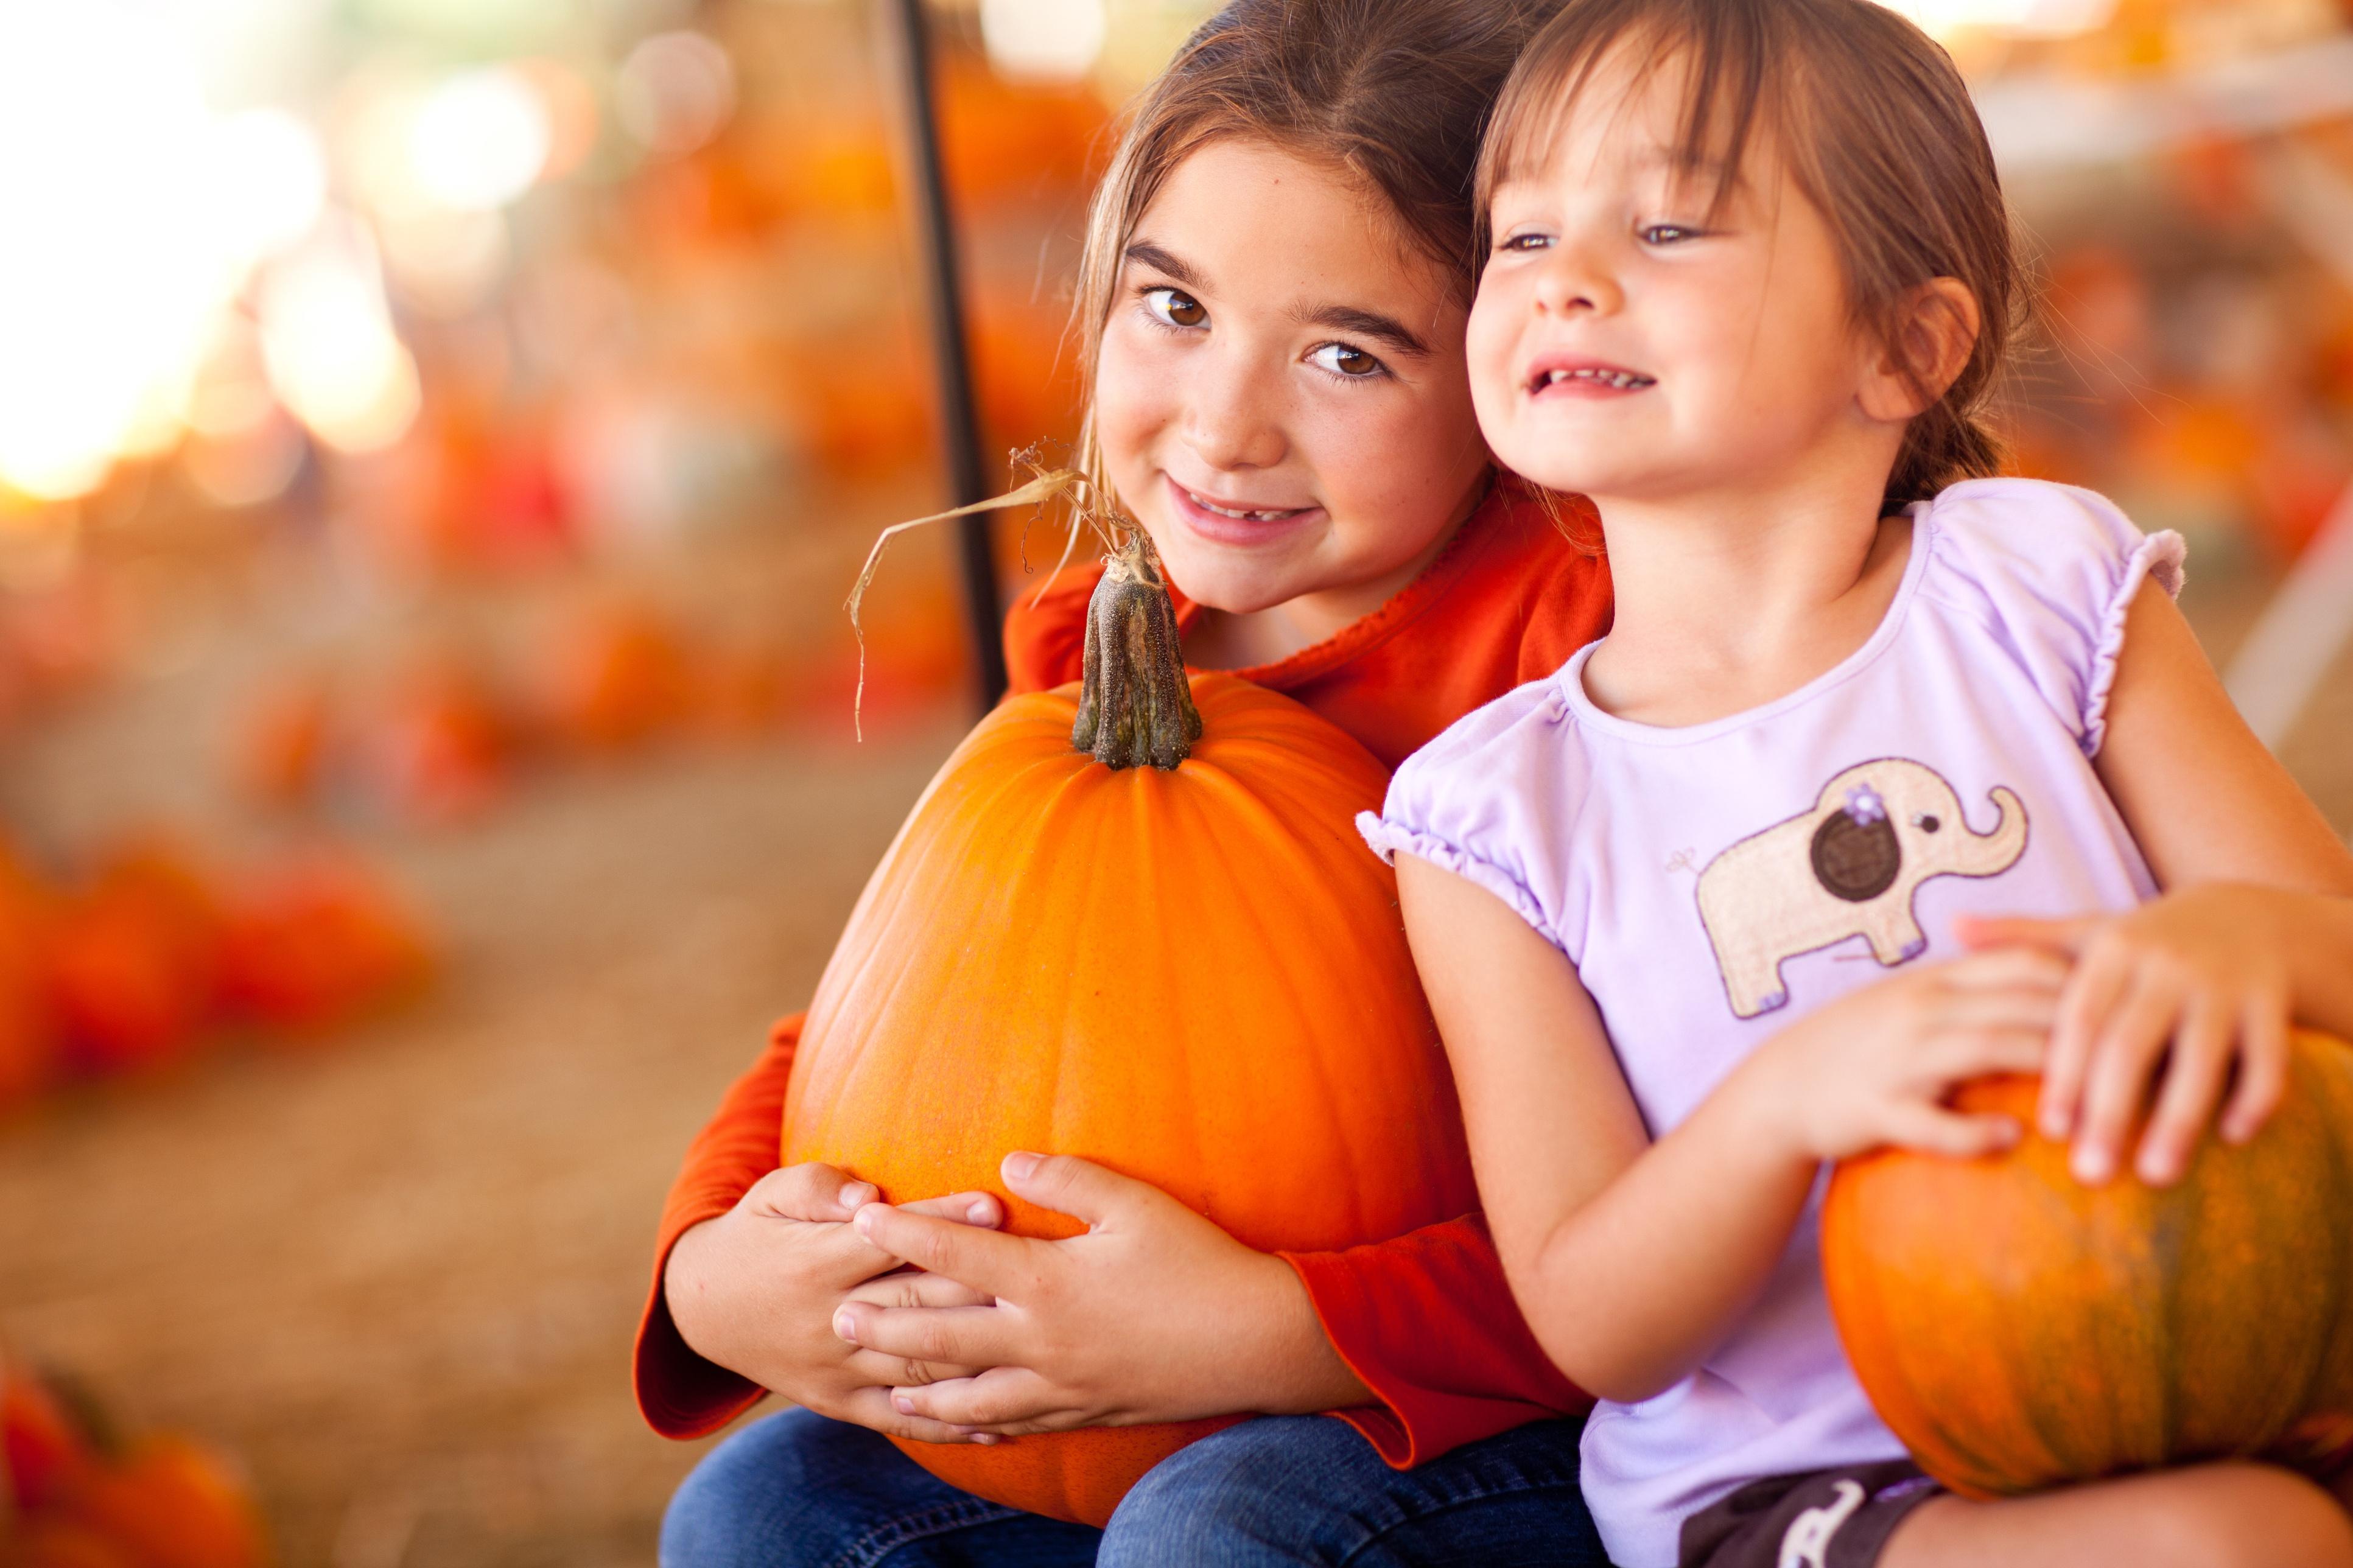 Pumpkins for Preschoolers: Games, Songs, Snacks and More